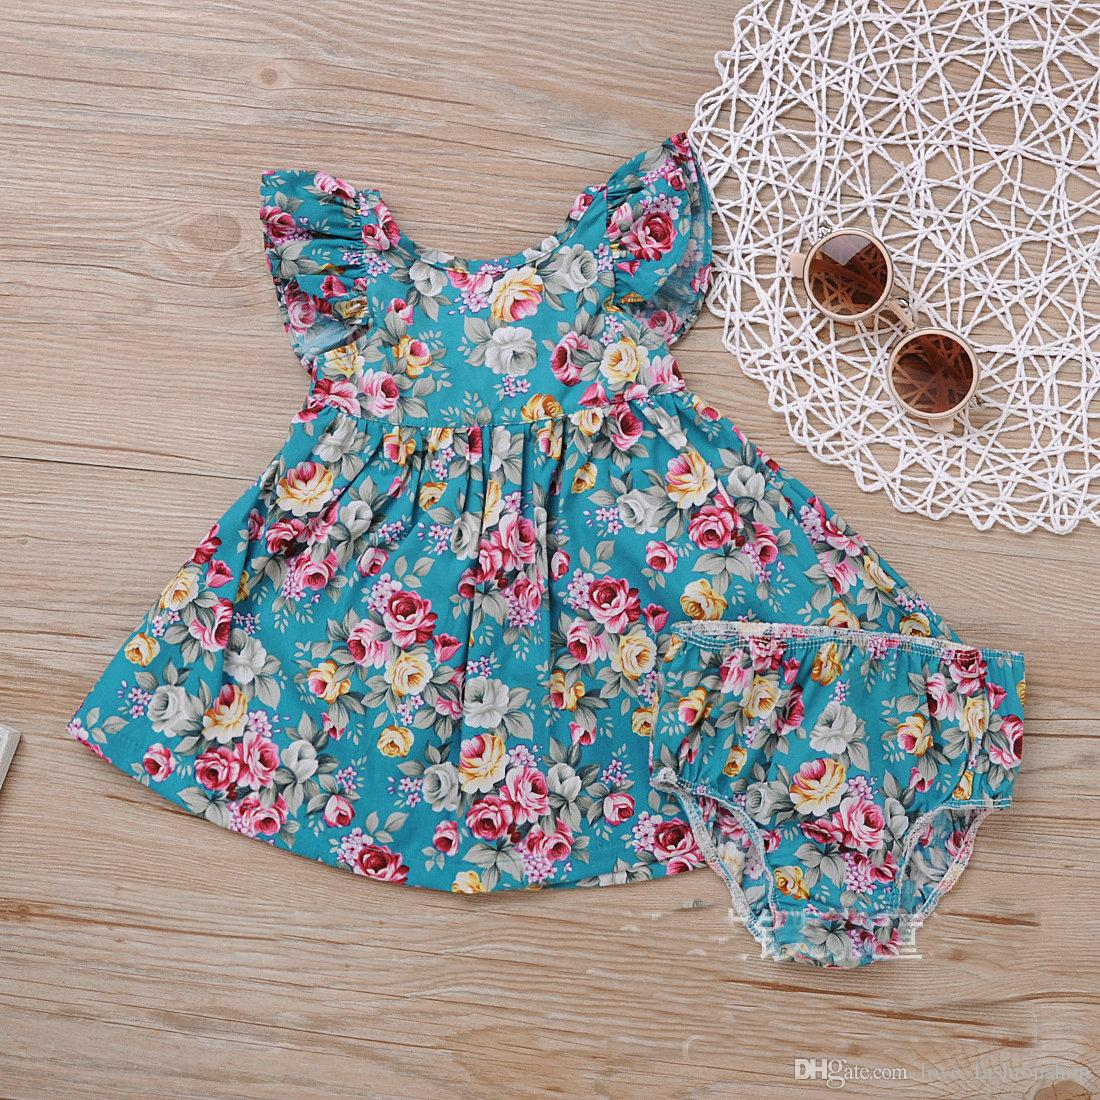 Retail Baby Meisjes Floral Jurken Twee Stukken Set Katoenen Jurk + Ondergoed Meisjes Beach Jurk Kinderkleding Kinderkleding